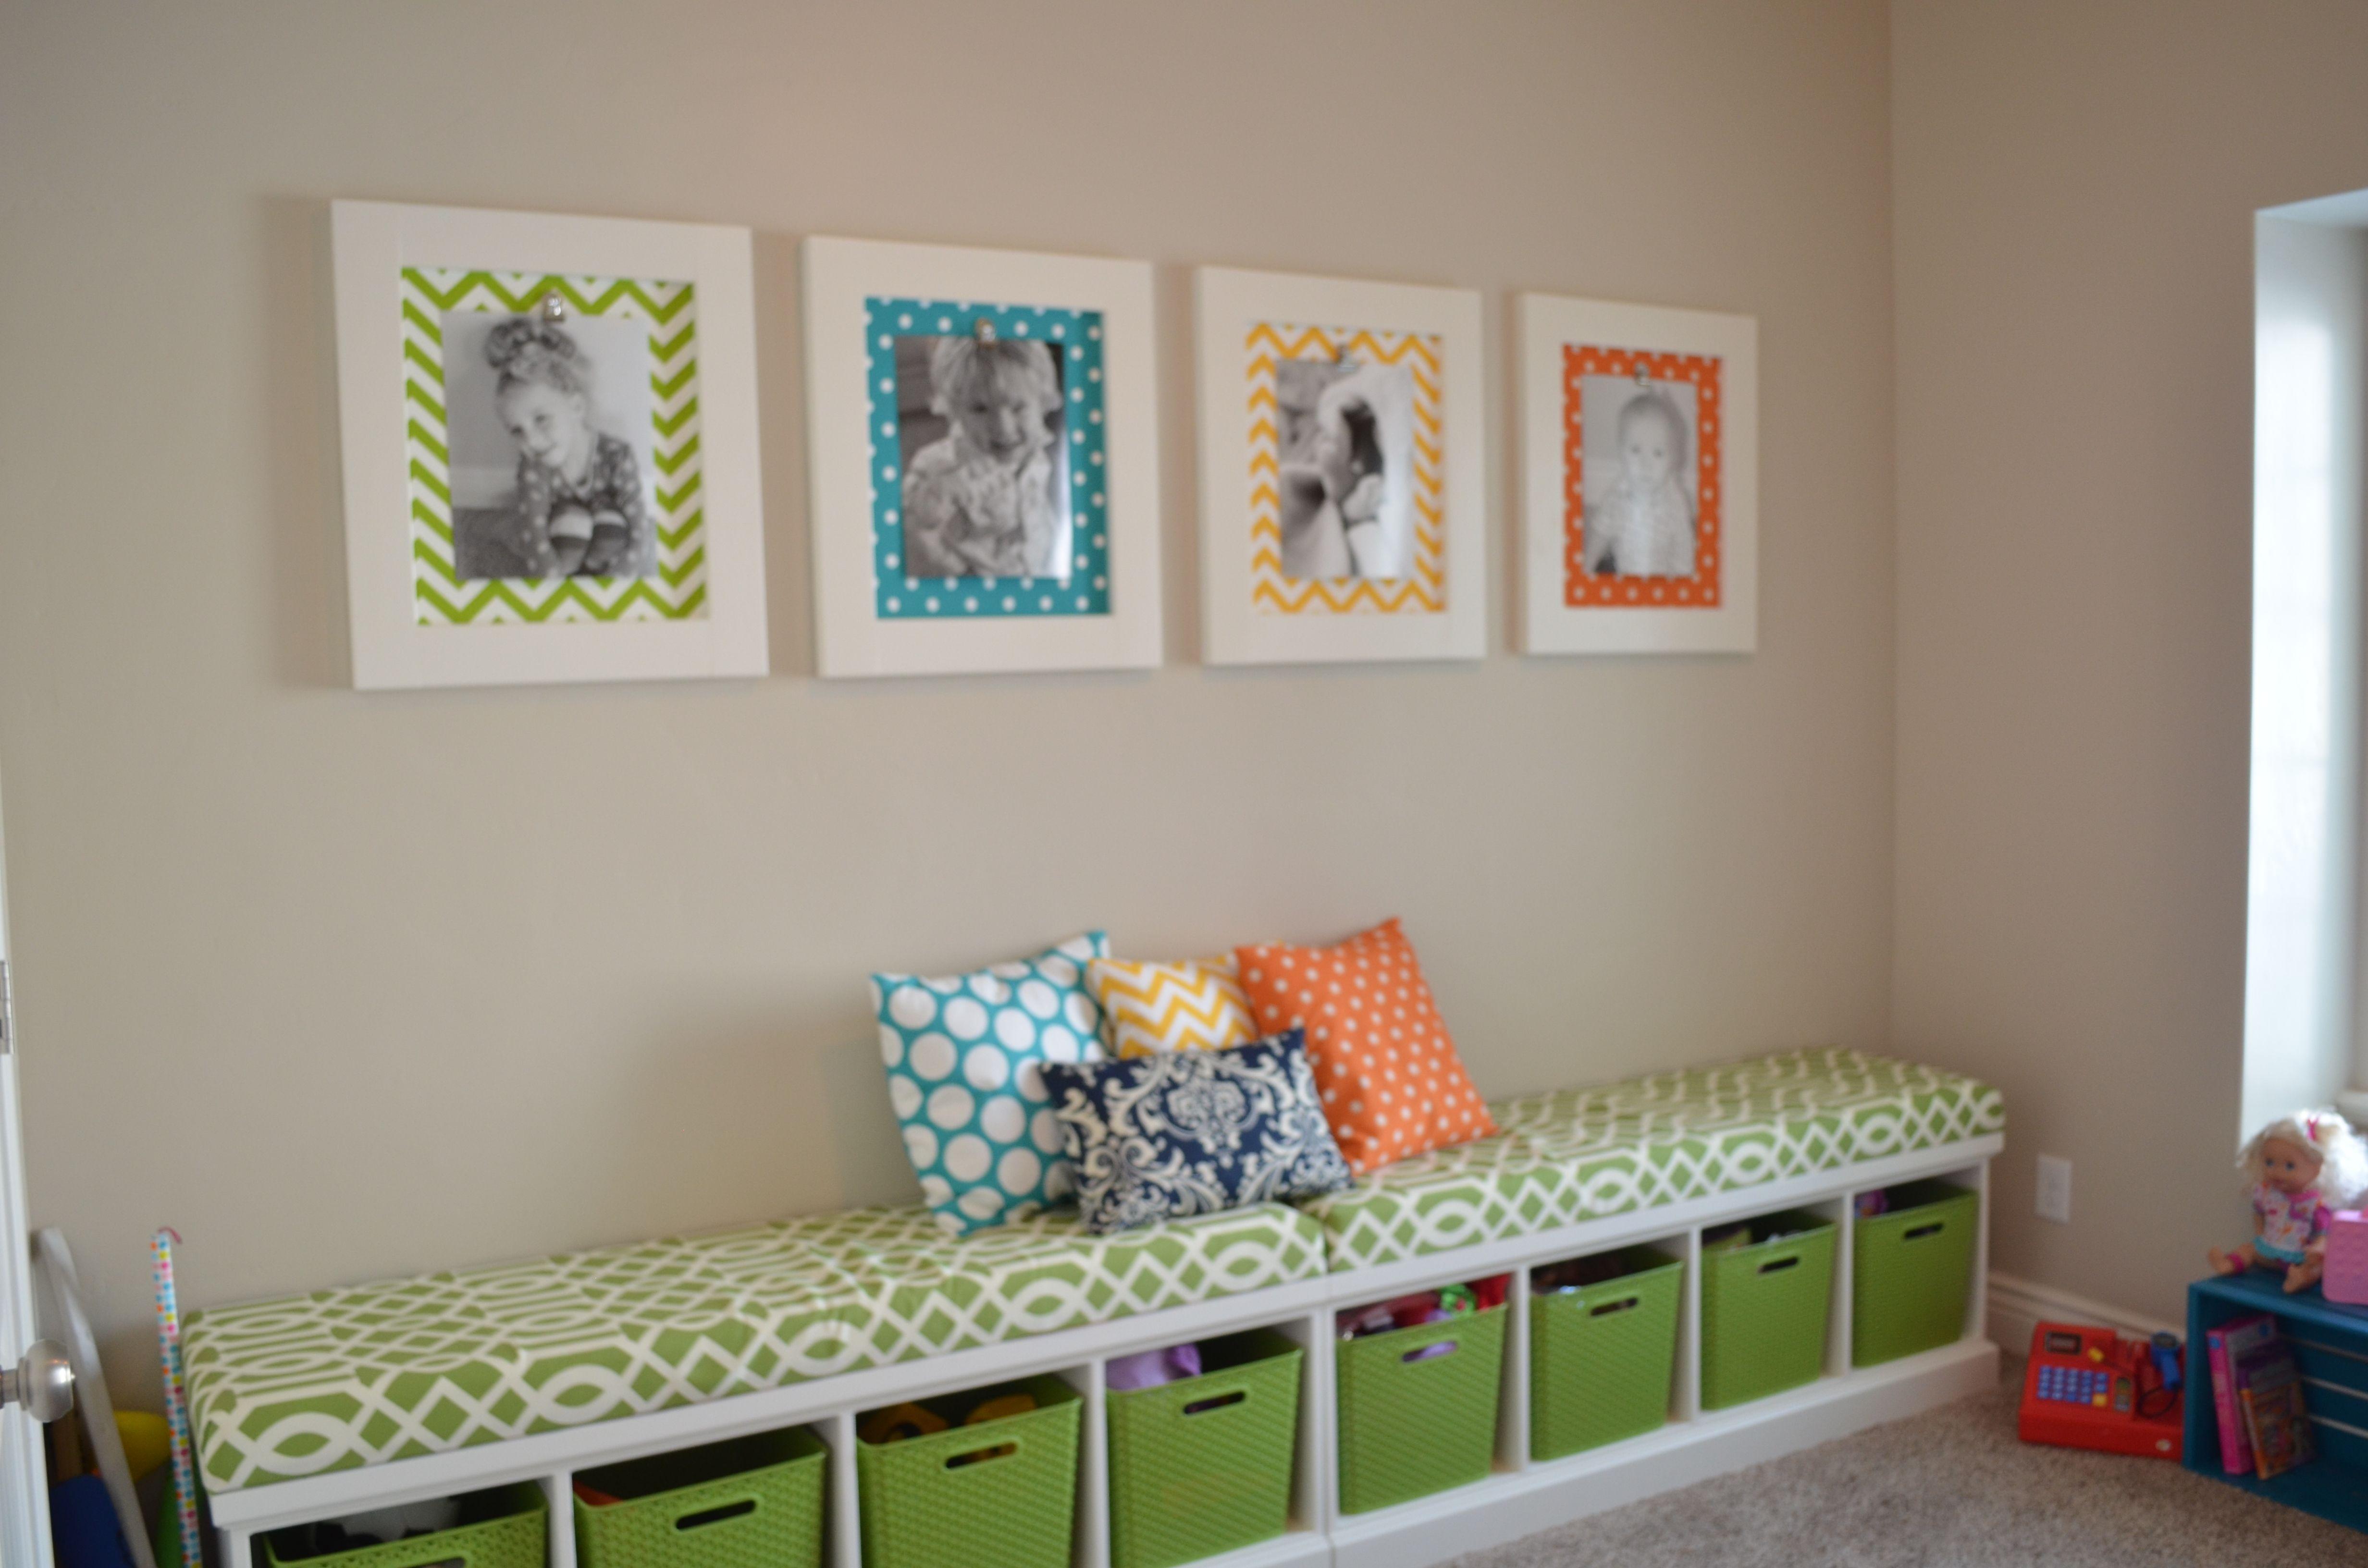 Childrens Kids Bedroom Furniture Set Toy Chest Boxes Ikea: Storage & Organization